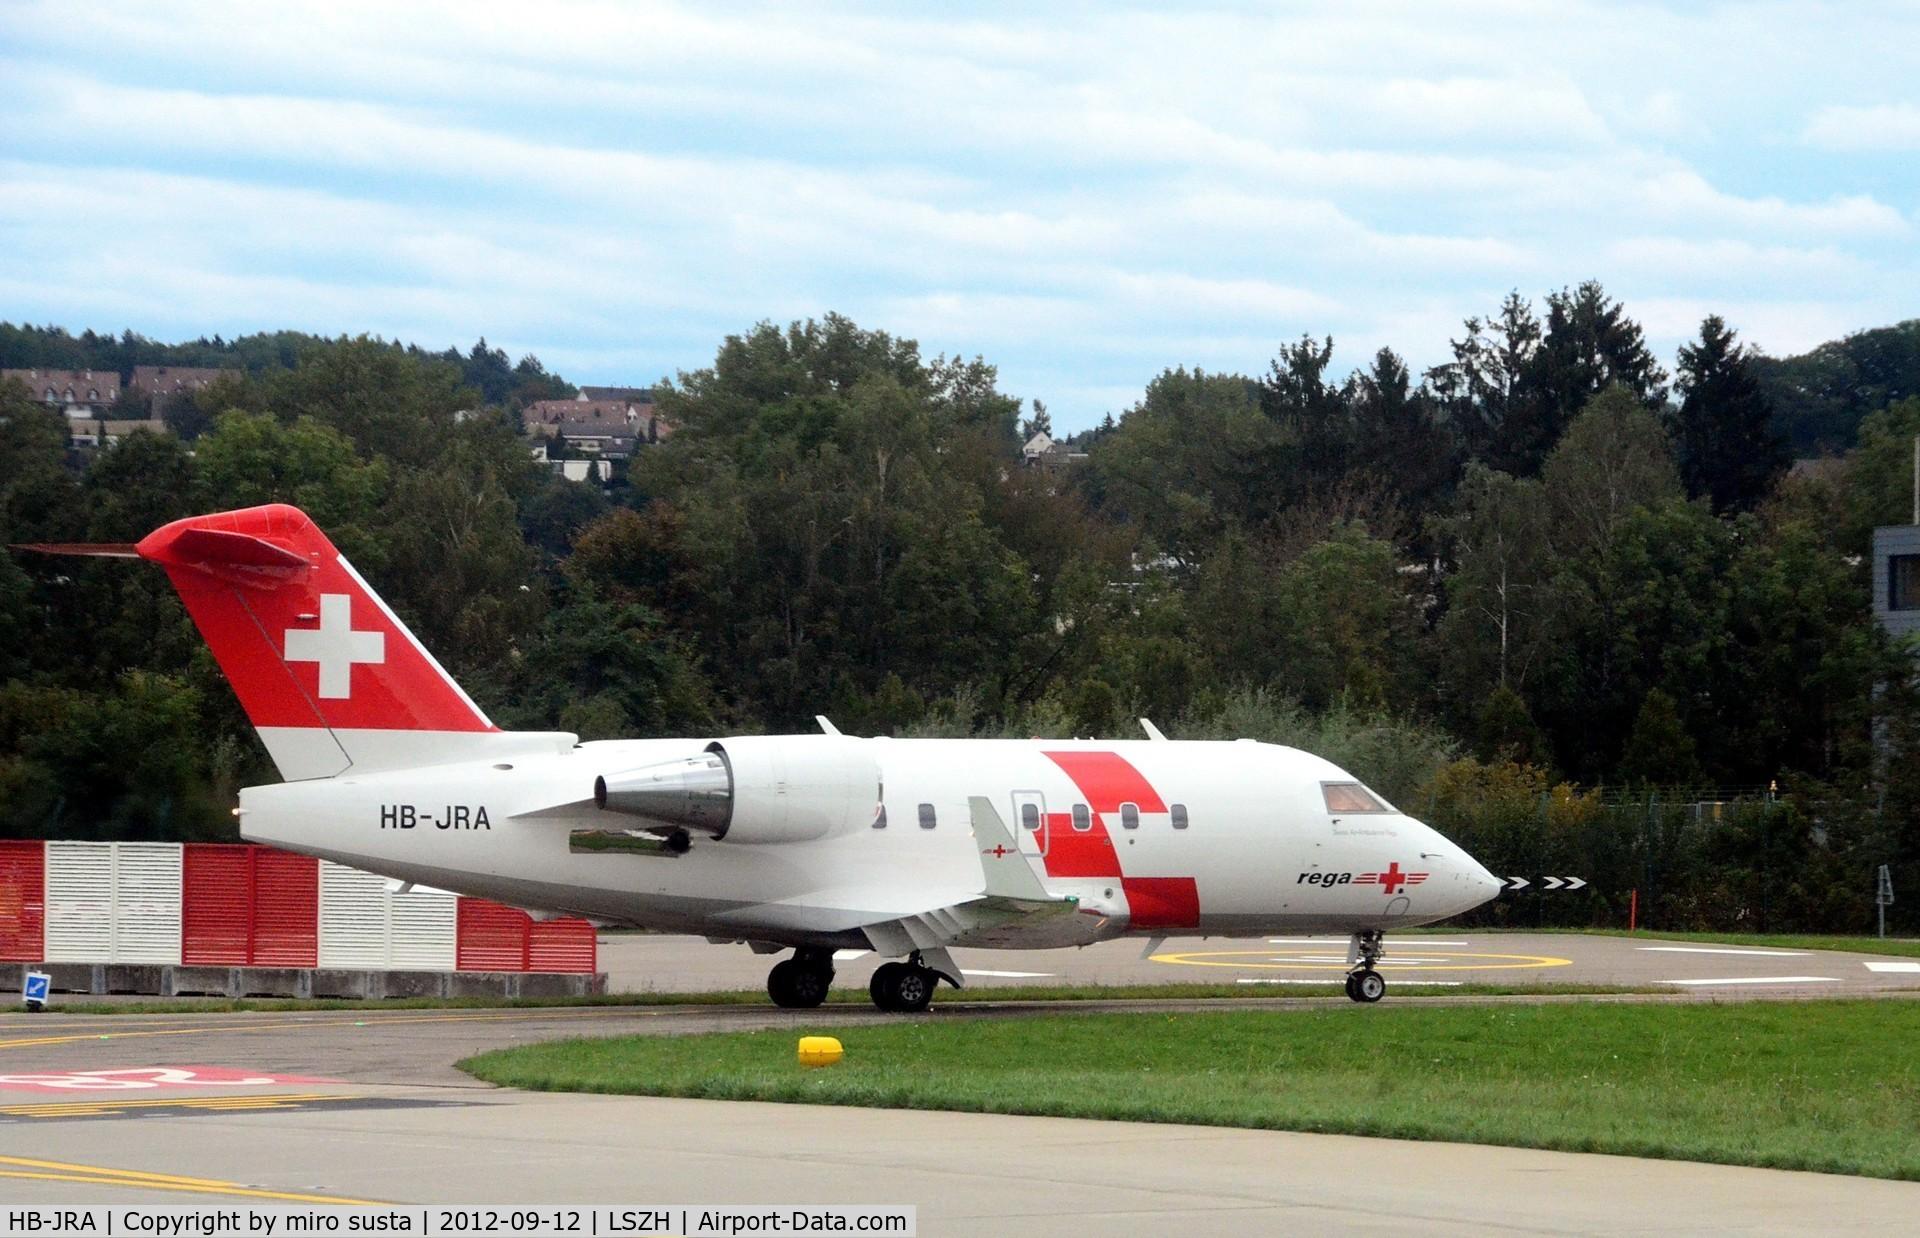 HB-JRA, 2002 Bombardier Challenger 604 (CL-600-2B16) C/N 5529, Swiss Air Rescue (Rega) Bombardier airplane after landing at Zurich-Kloten International Airport, photo through airplane window.